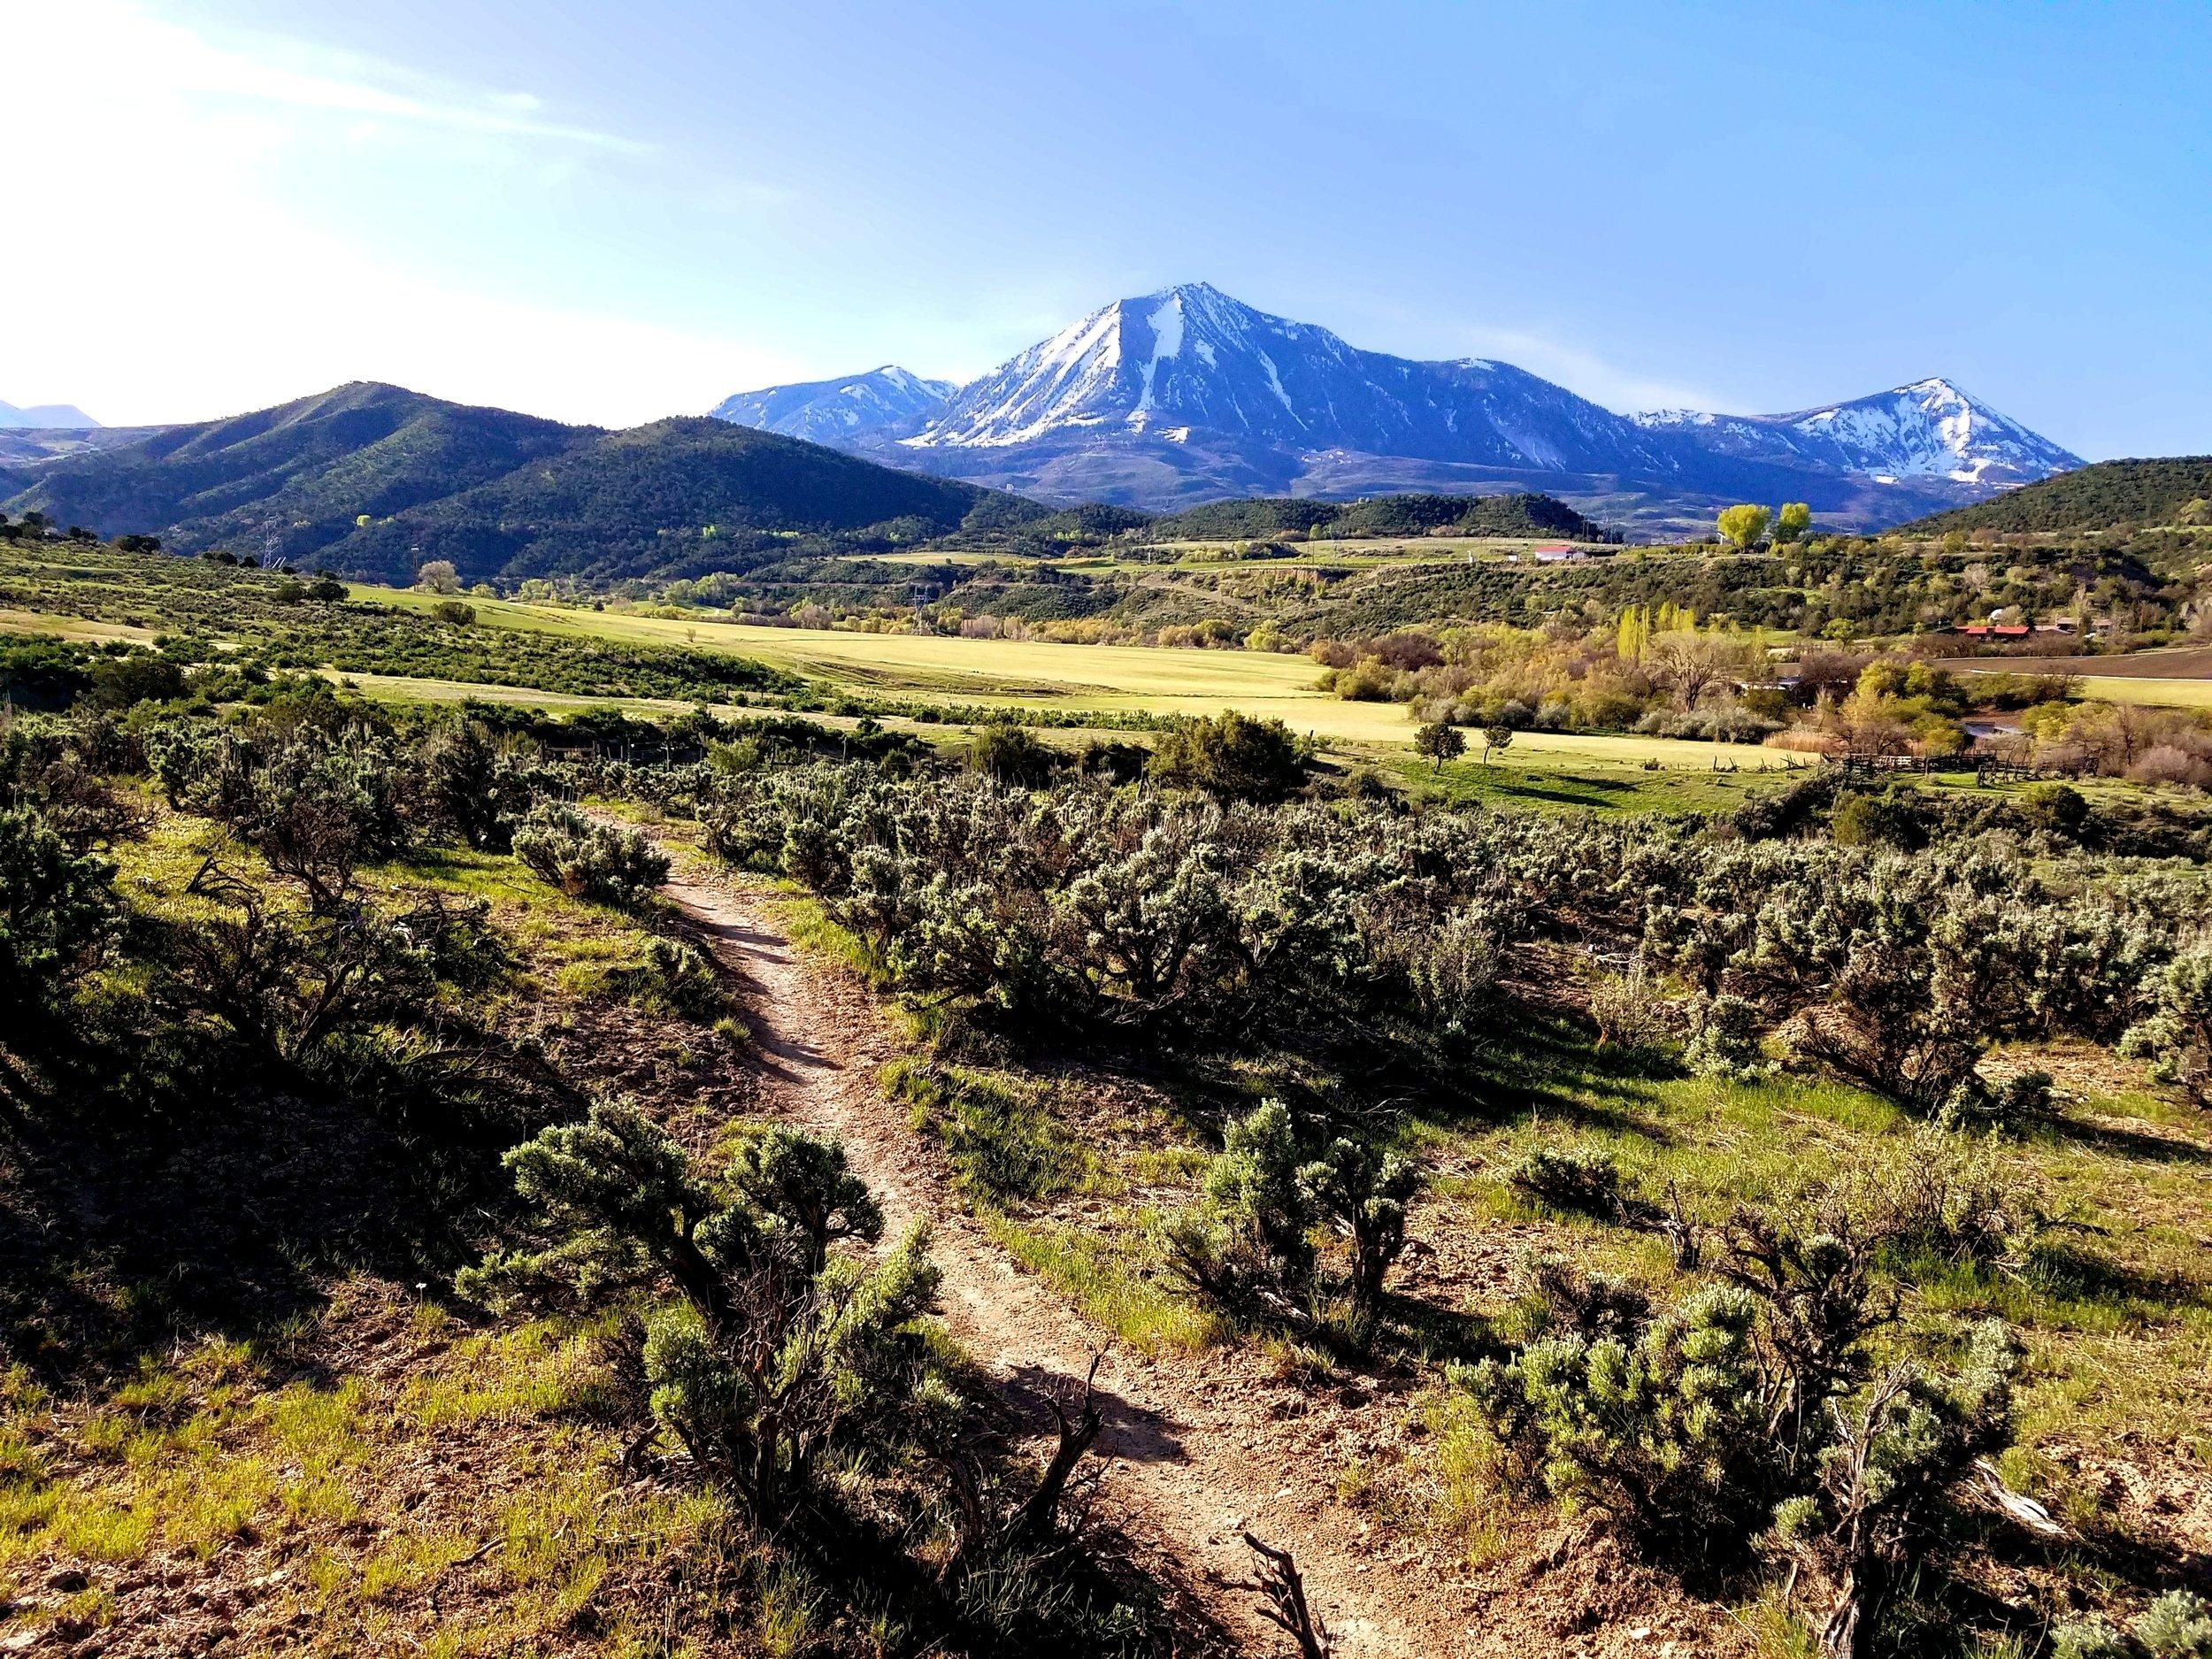 Mt. Lamborn thumbnail